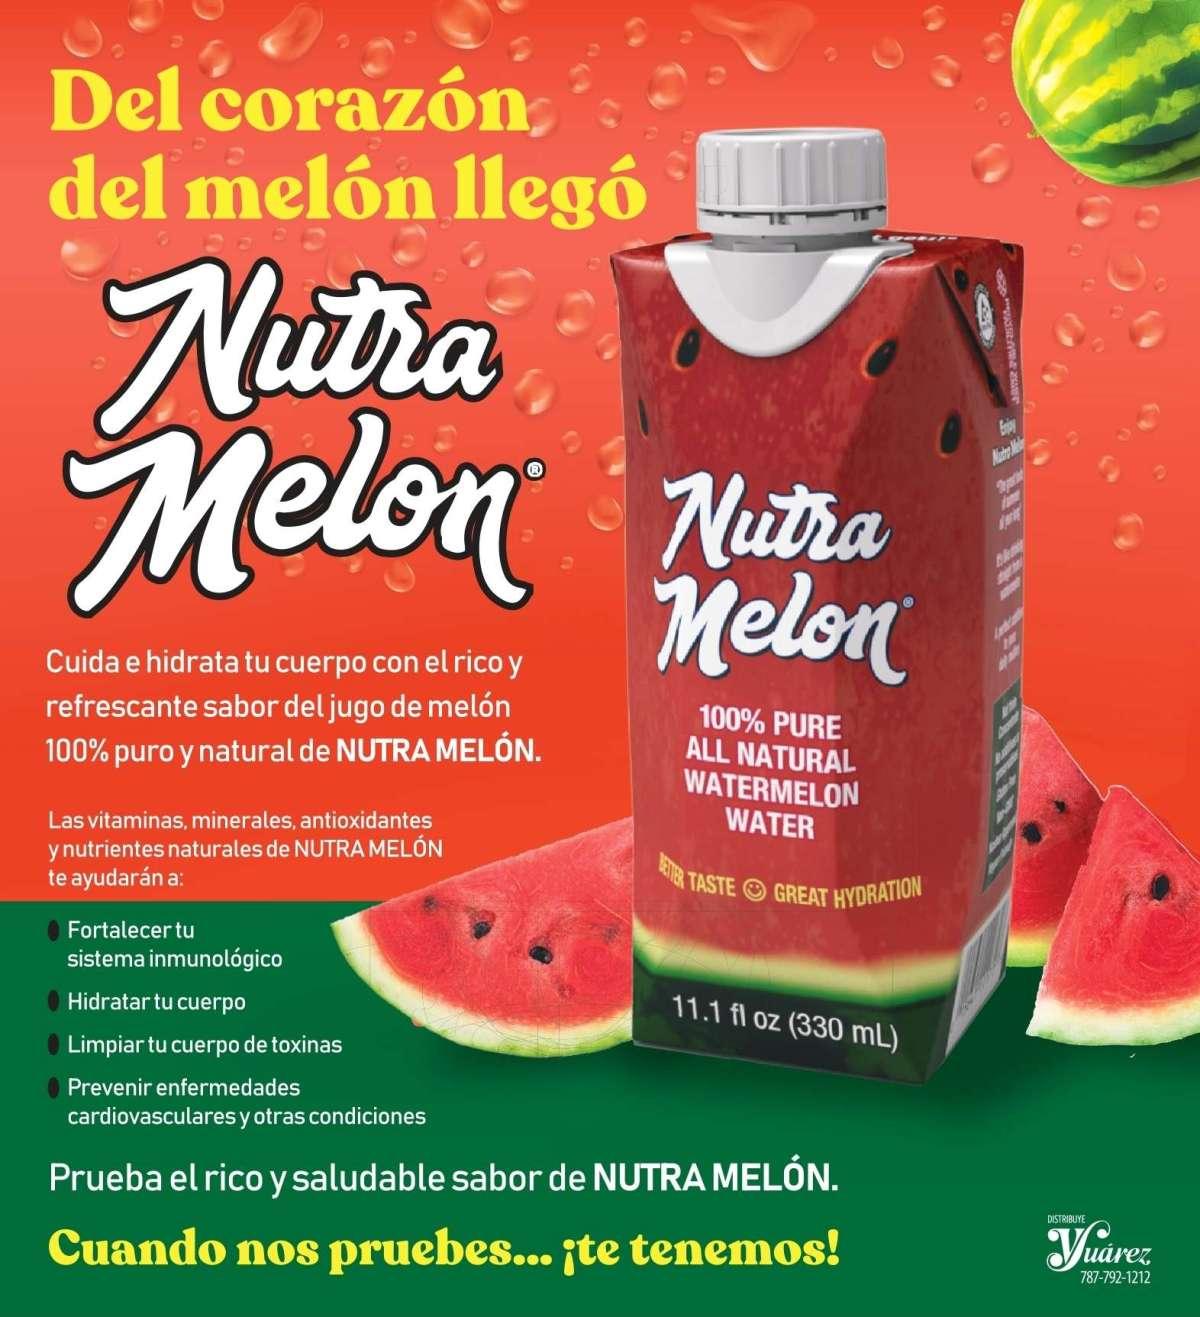 Nutra Melon